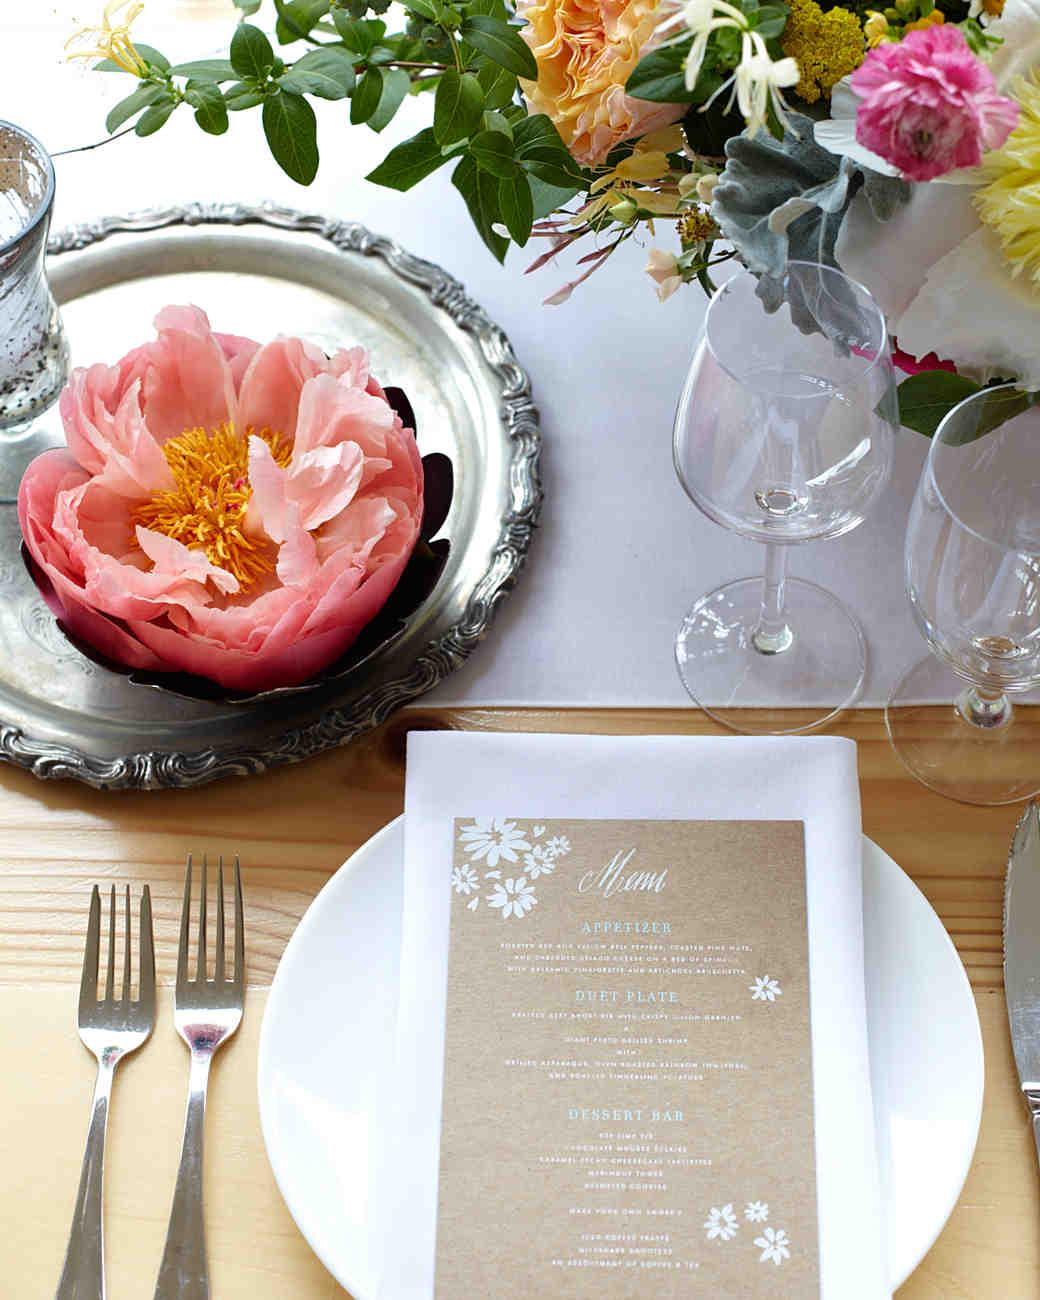 leanna-matt-wedding-place-setting-0008-s111371-0615.jpg